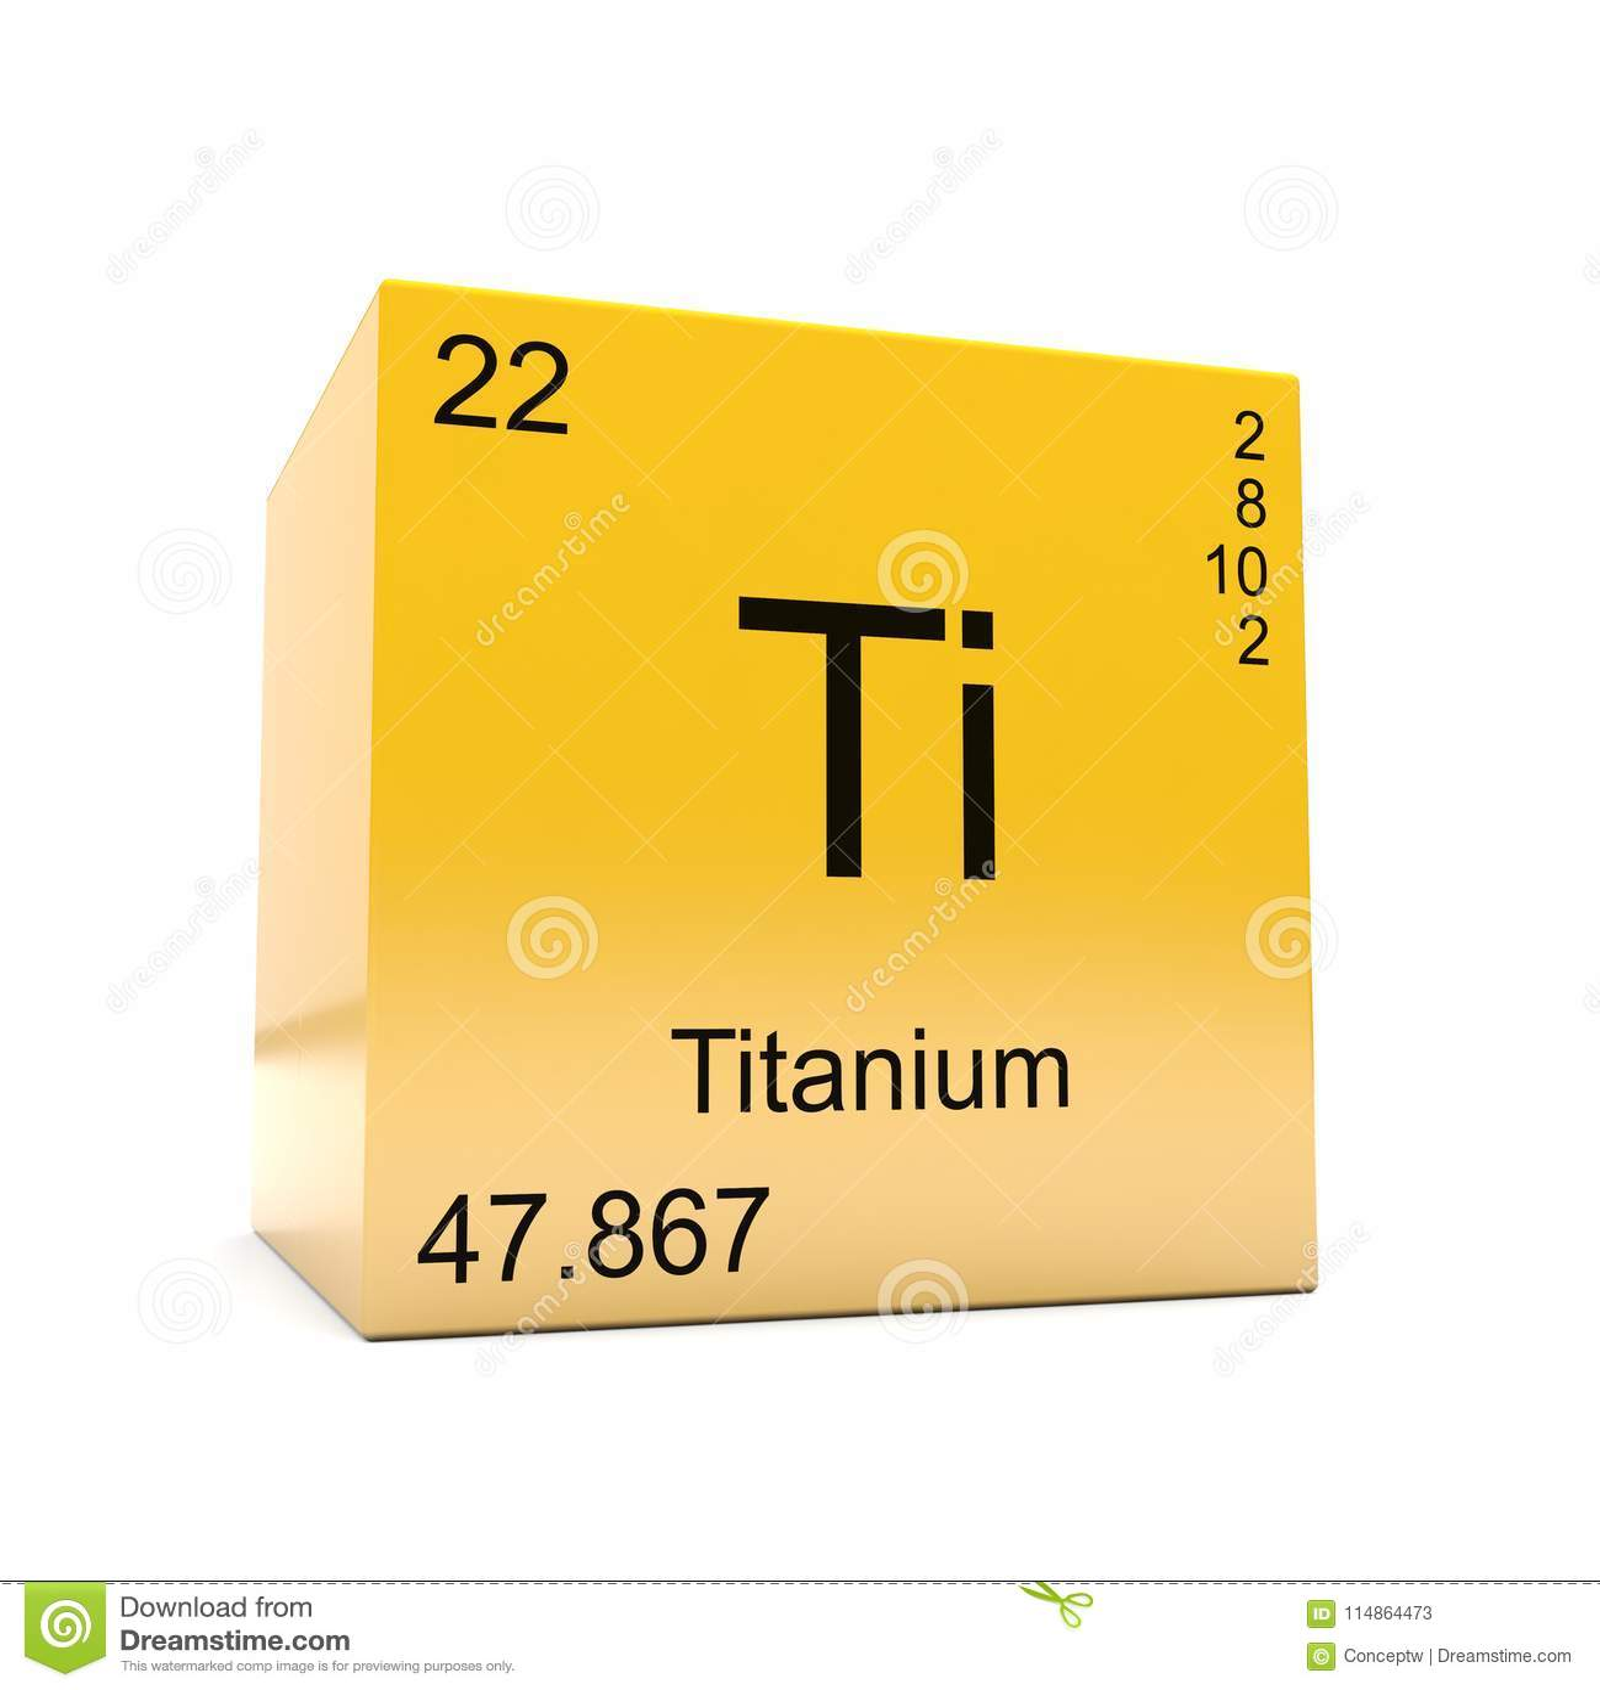 Titanium Chemical Element Symbol From Periodic Table Stock